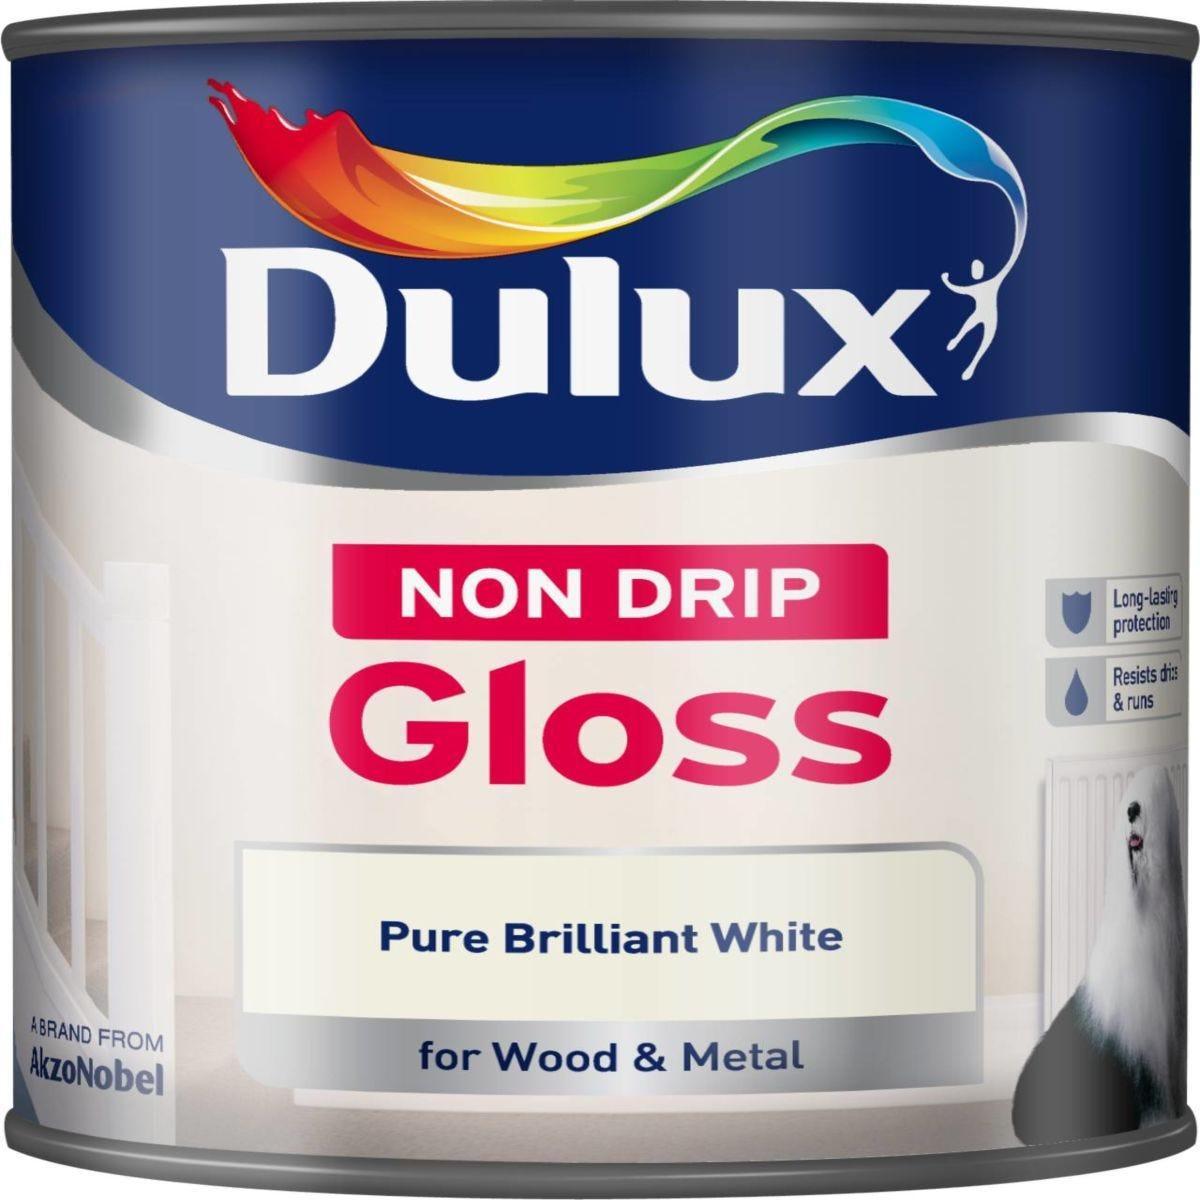 Dulux Non-Drip Gloss Paint – Pure Brilliant White – 750ml